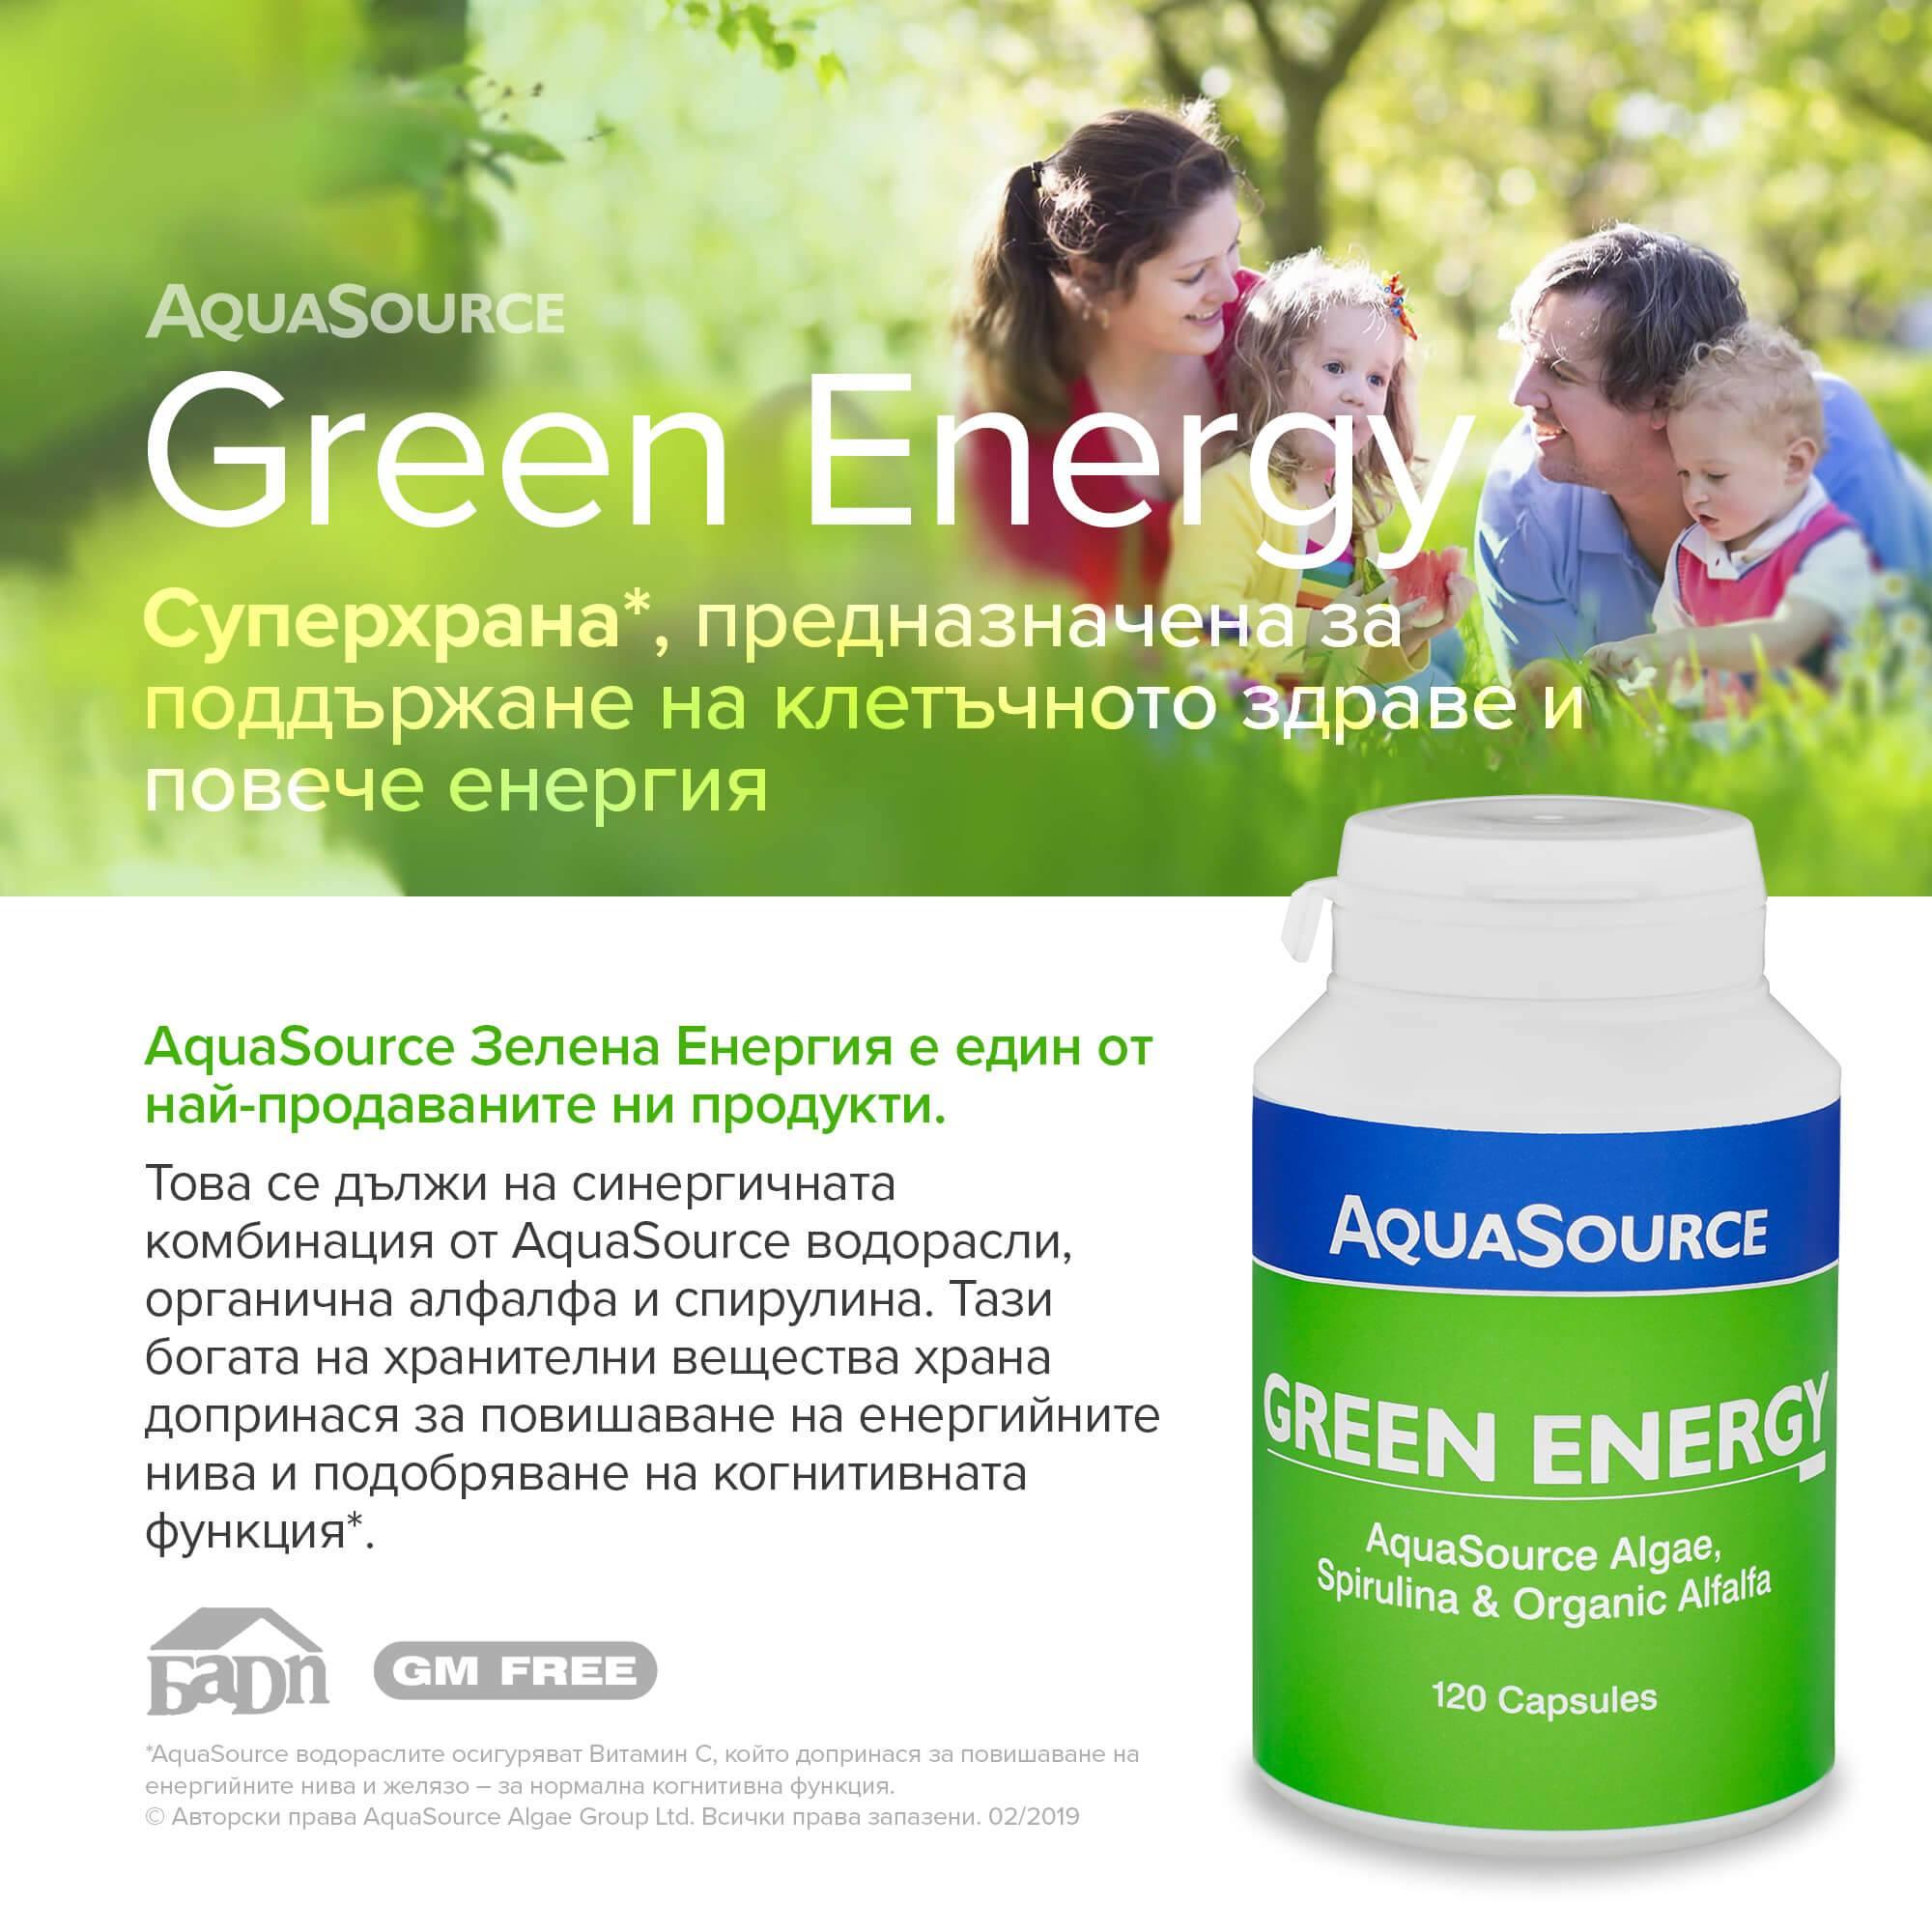 Аквасорс, зелена енергия